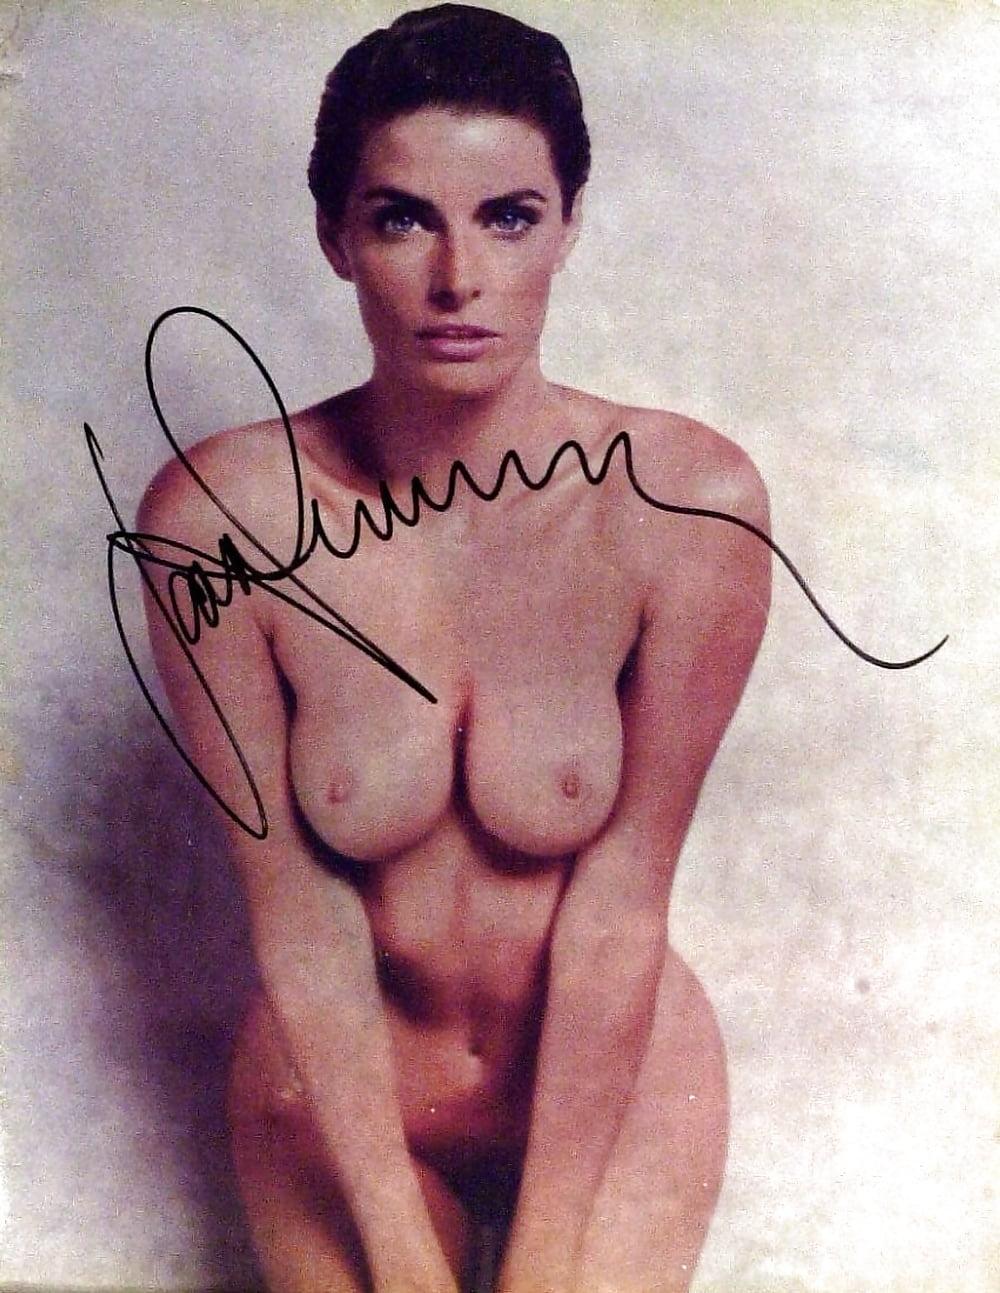 Joan severance threesome, sexy anal insertion pics